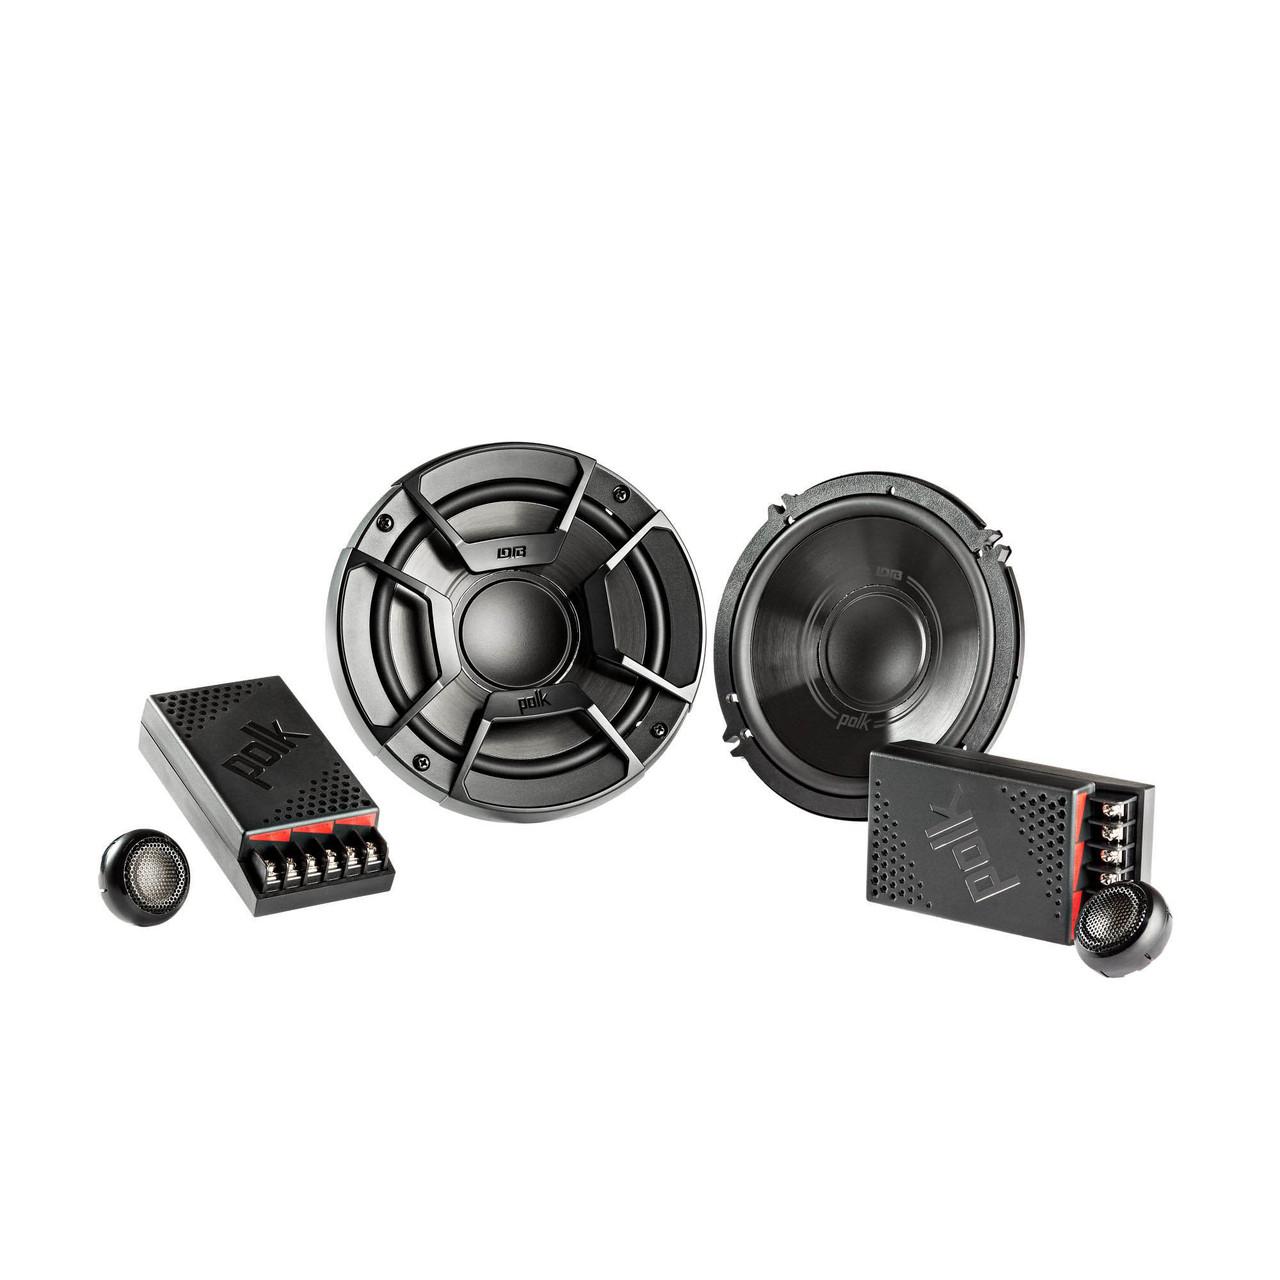 Polk Audio Bundle - A Pair Of DB6502 6.5